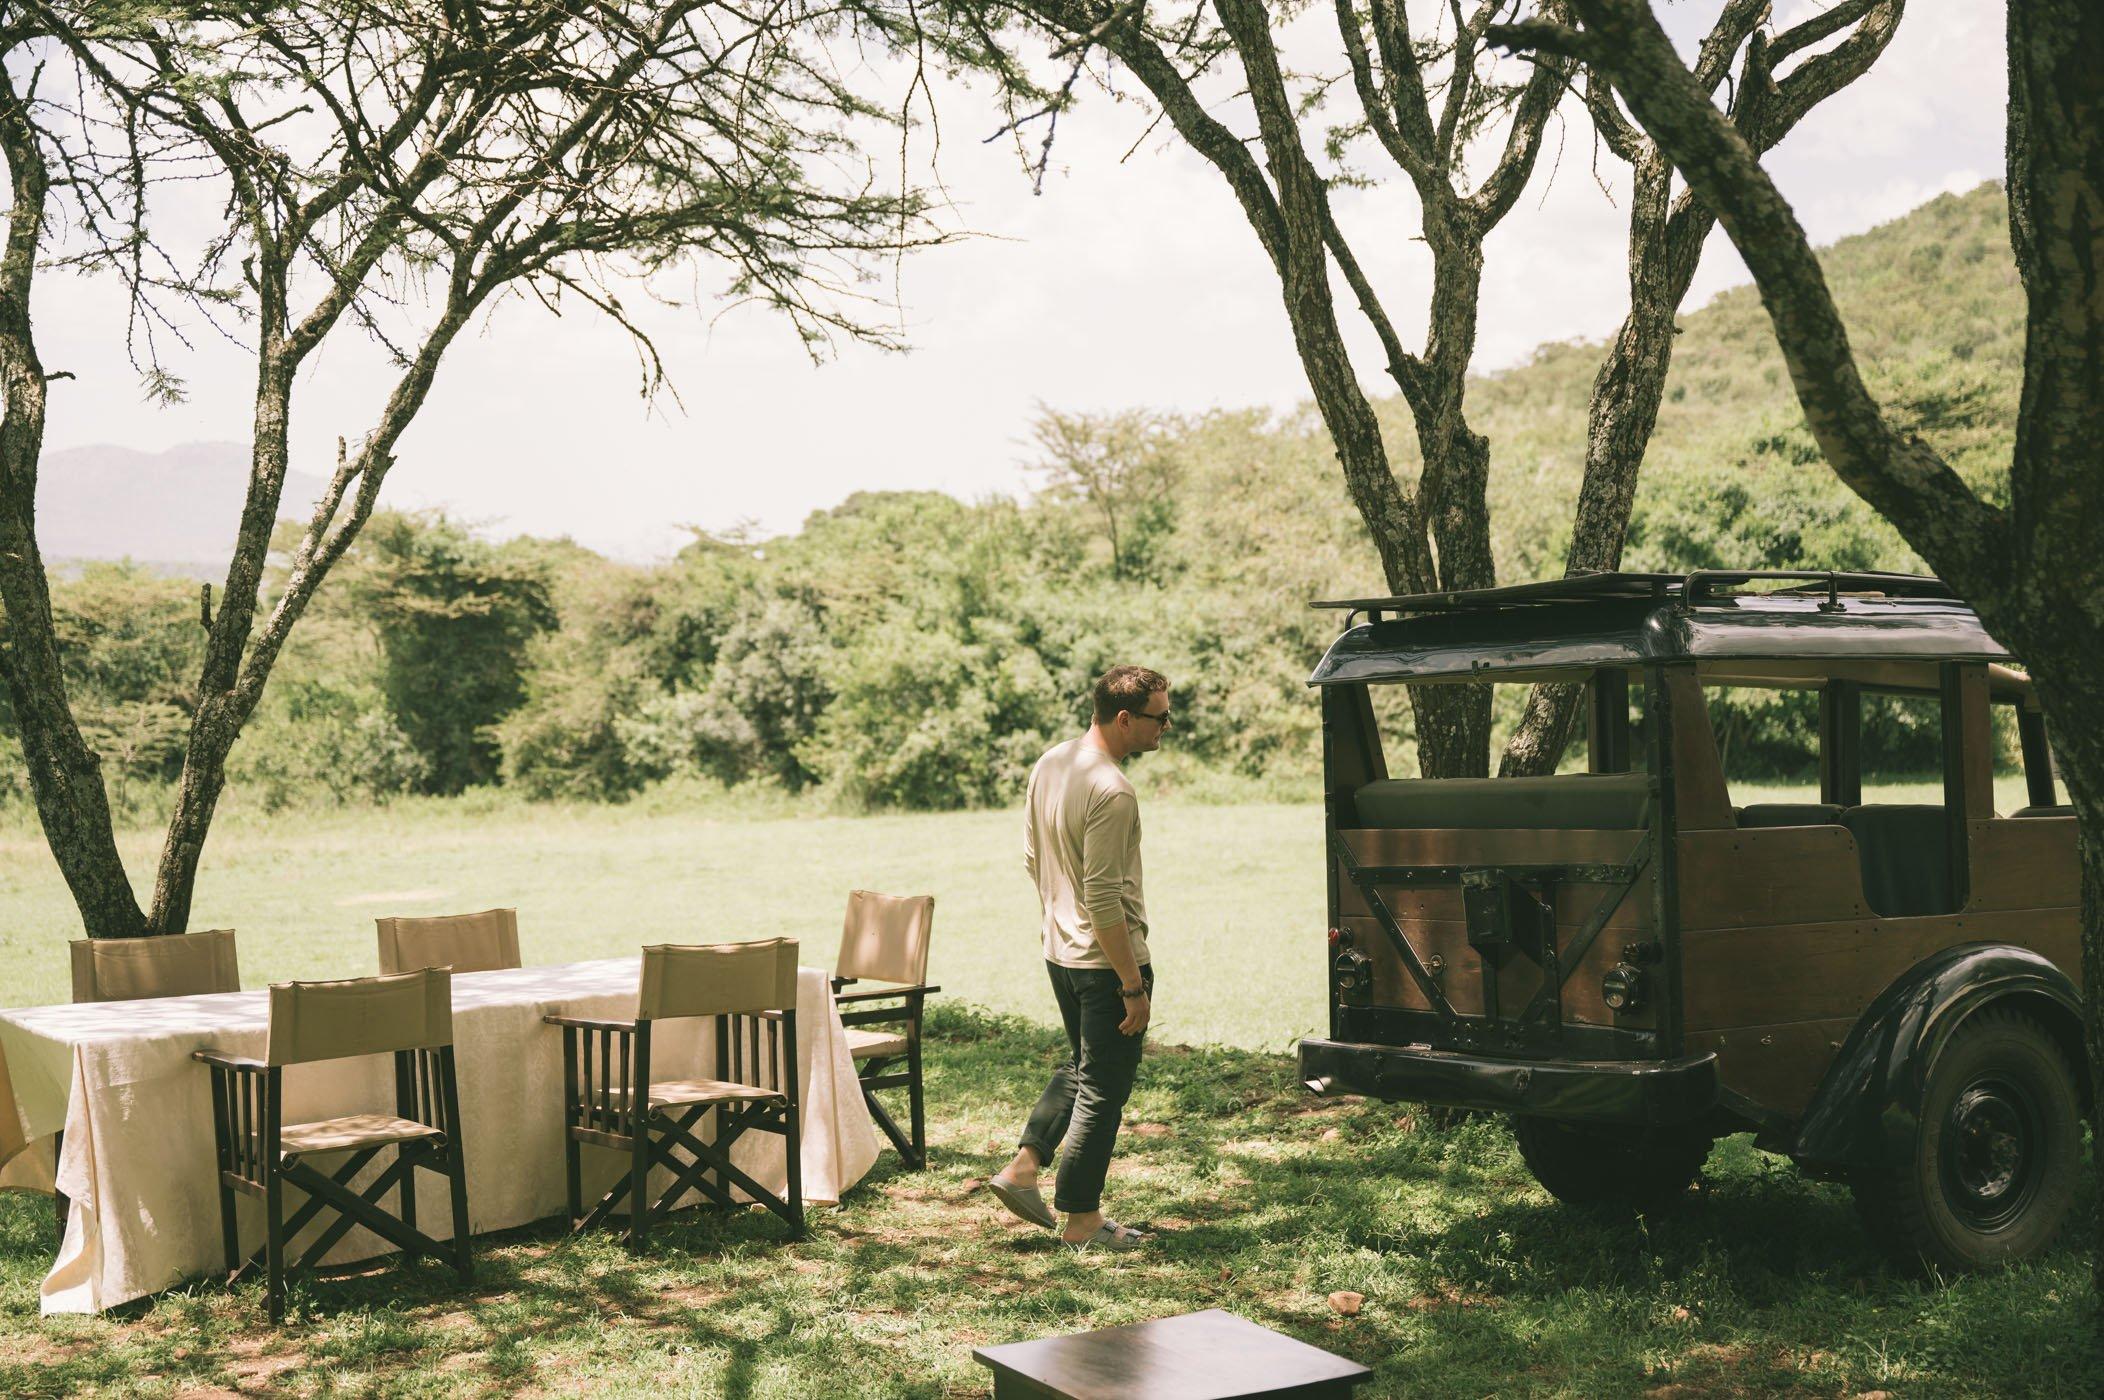 Cottar's 1920s Safari Camp - Cottar's Safaris Kenya